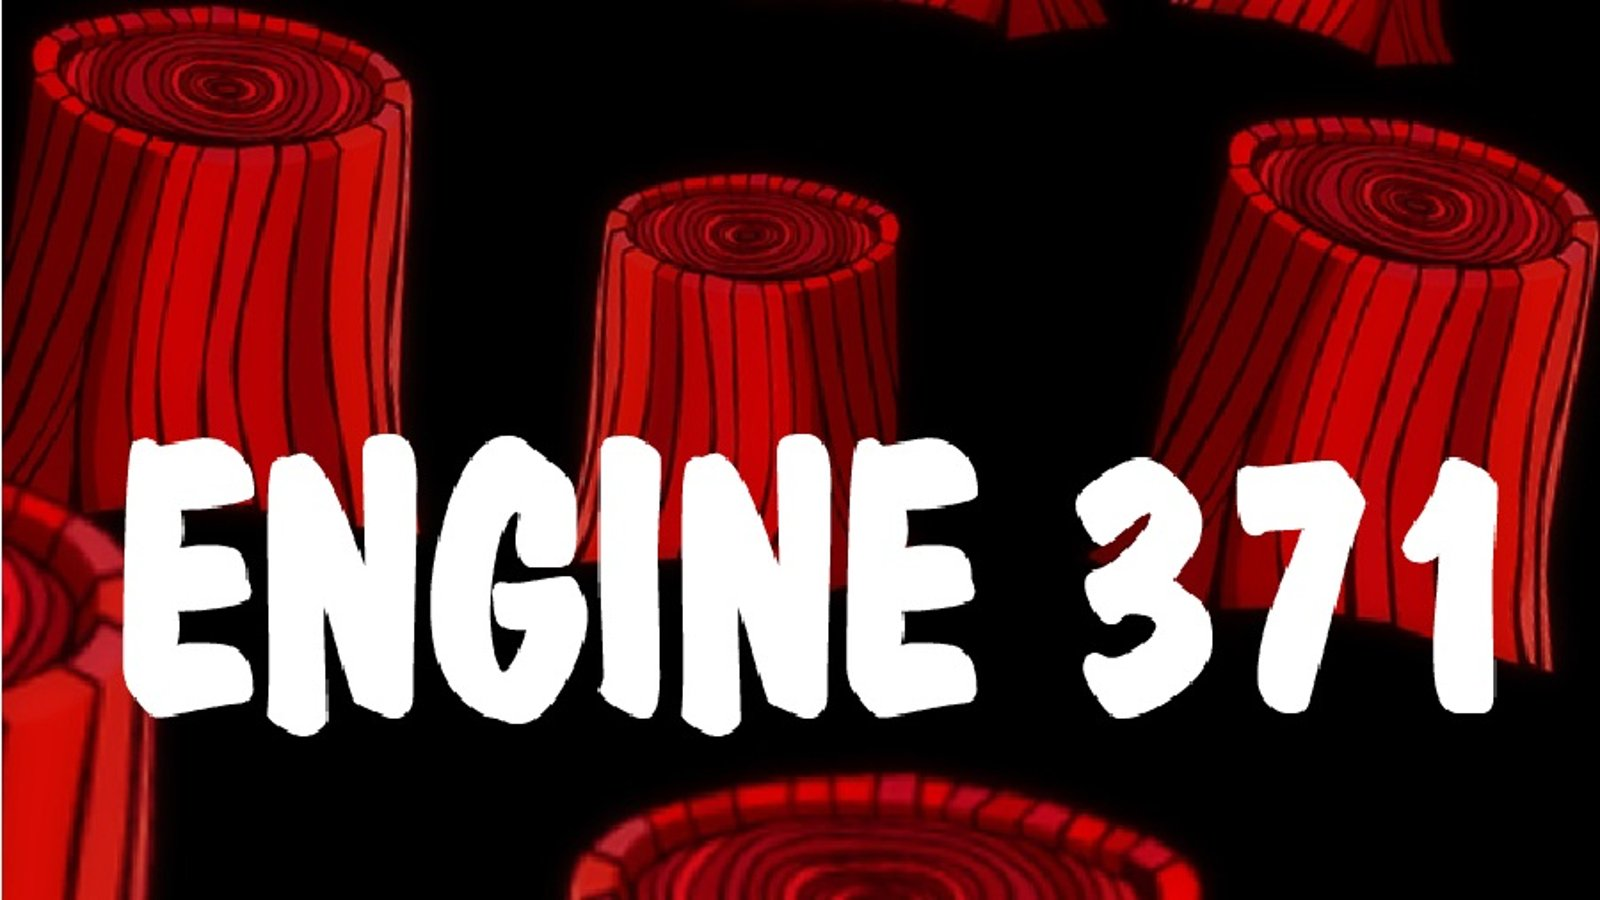 Engine 371